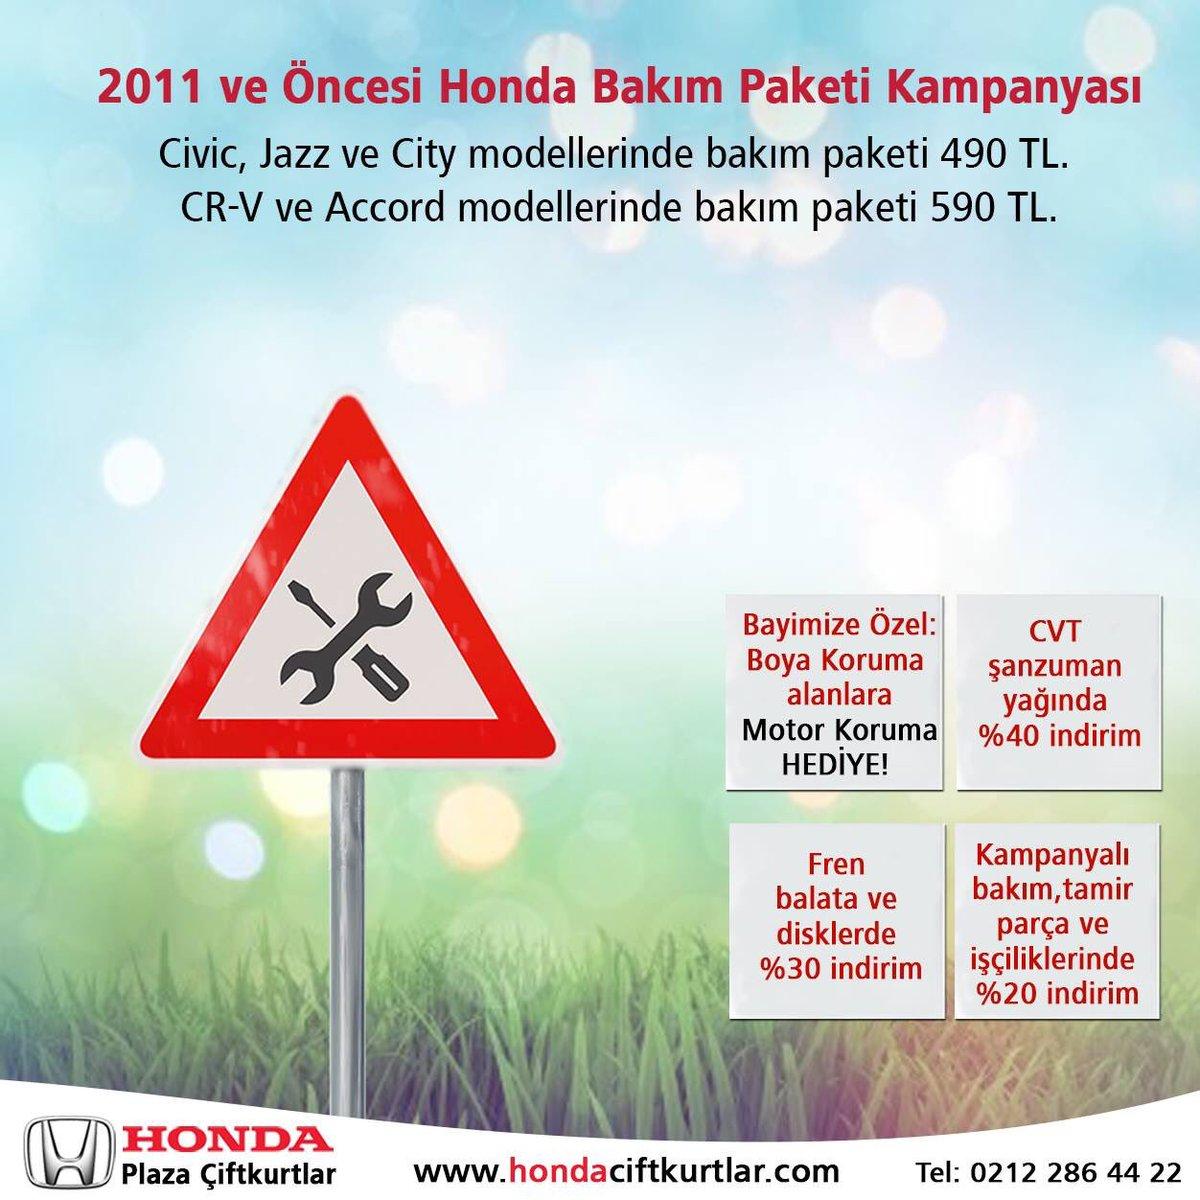 Honda çiftkurtlar At Maslakhonda Twitter